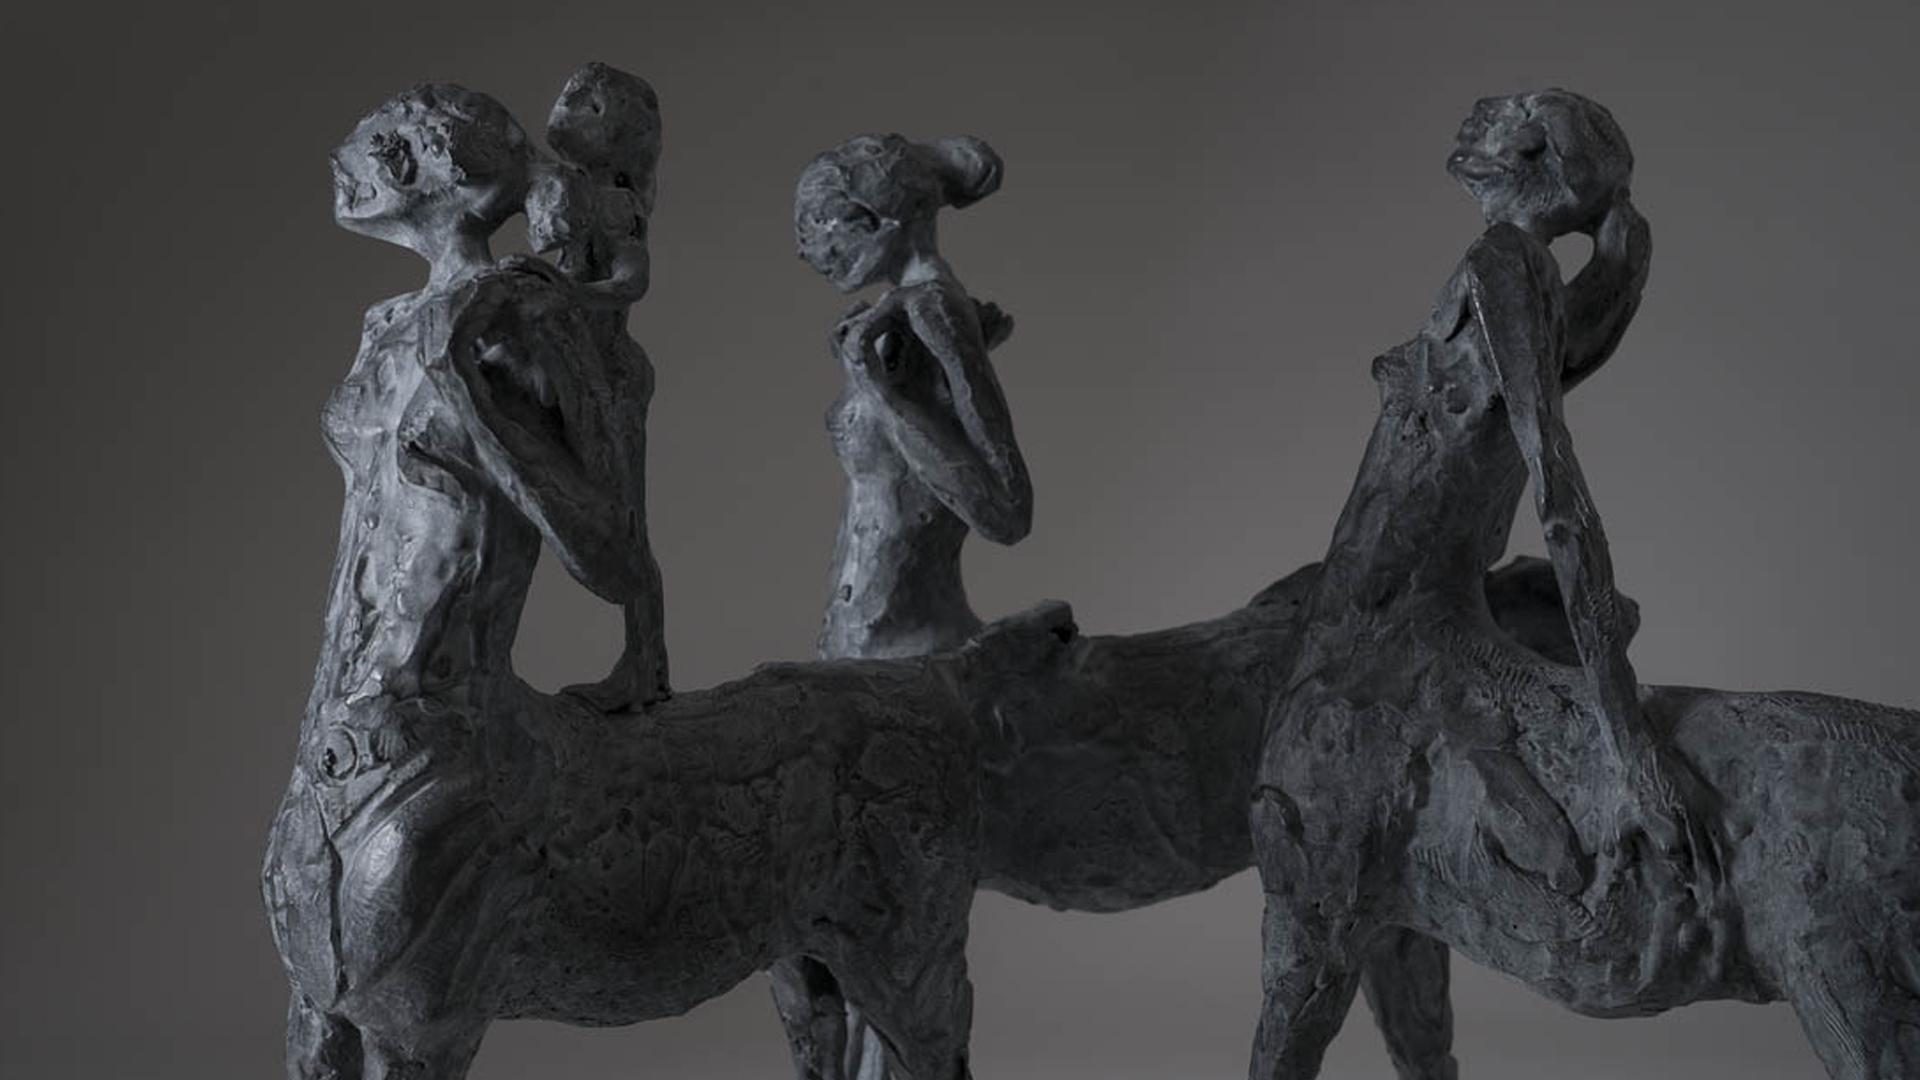 scansione-digitale-opera-centauras-pellegrinas-arte-pietrasanta-Studio_B19